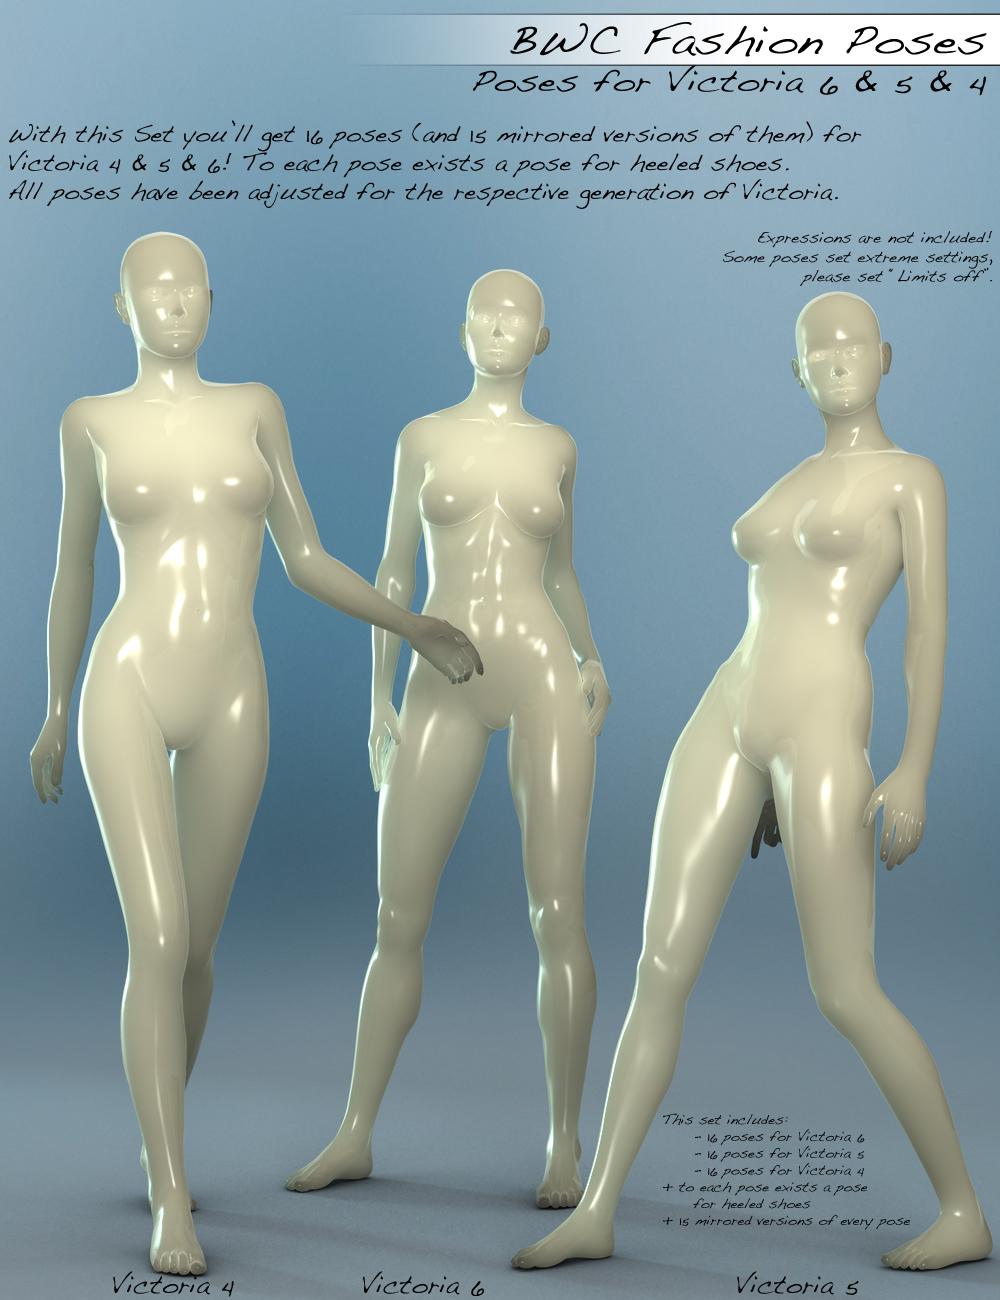 BWC Fashion Poses for V6, V5 and V4 by: Sedor, 3D Models by Daz 3D